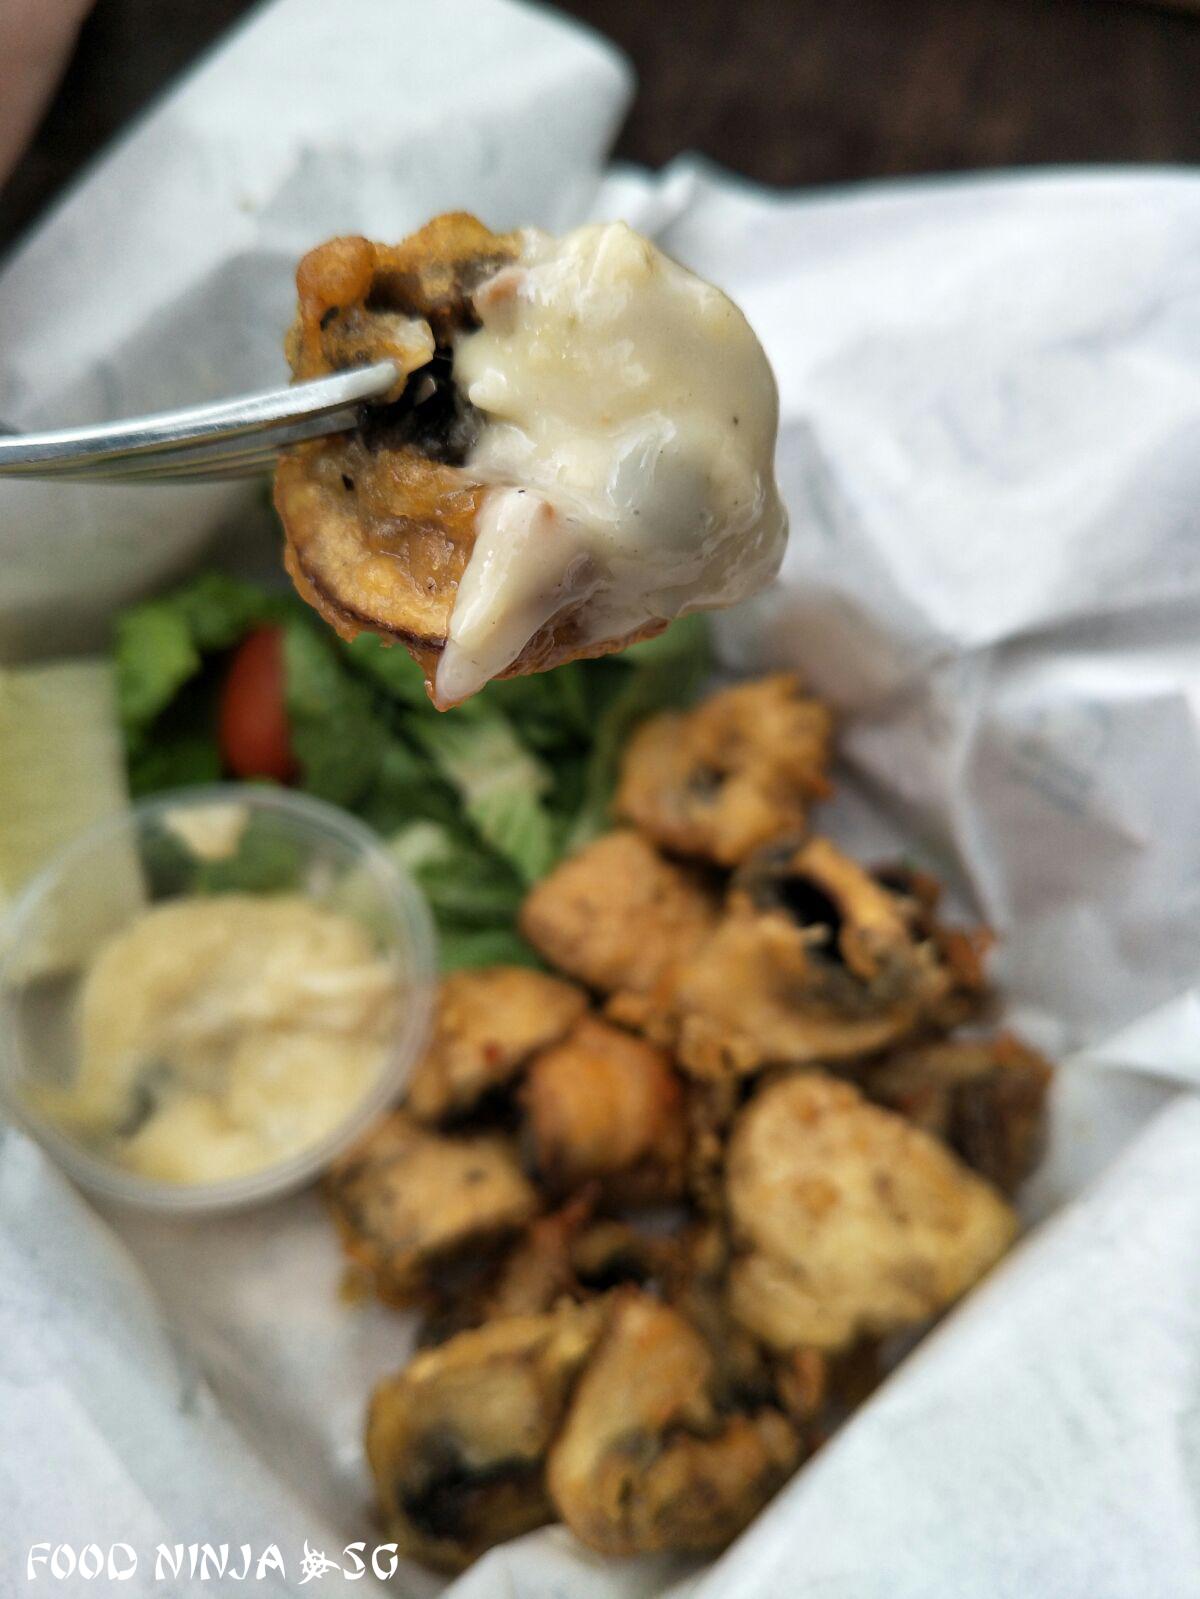 Fast Food Restaurant With Deep Fried Mushrooms